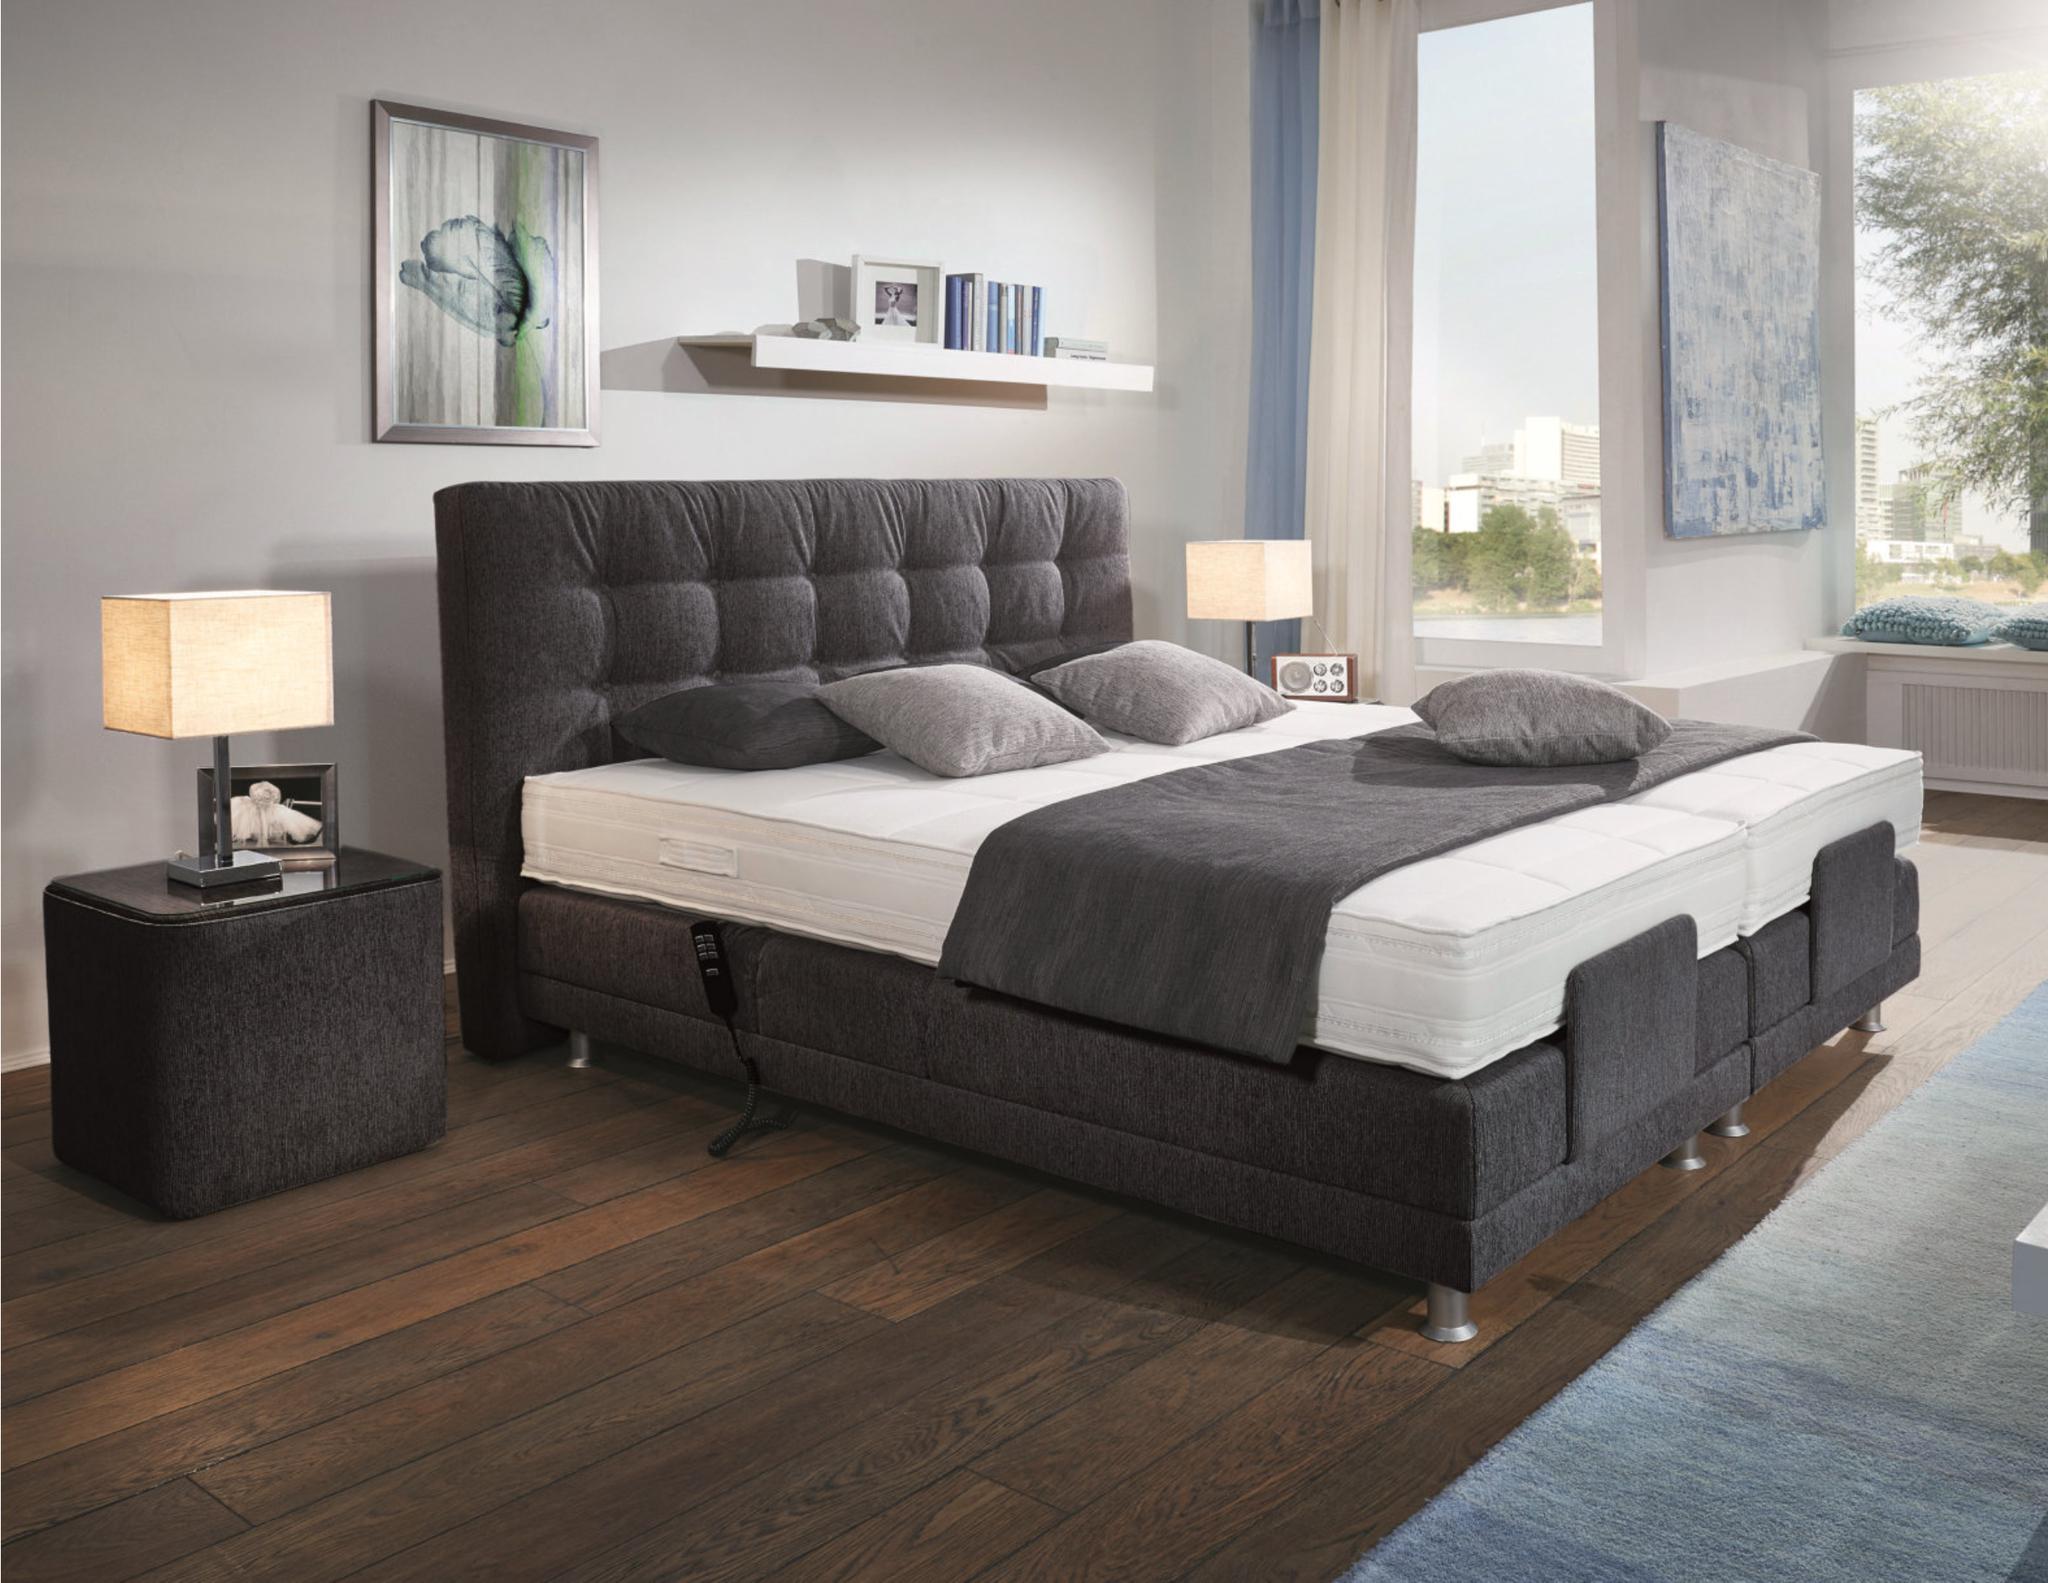 Interior Design For Boxspringbett Kaufen Best Choice Of Lyon